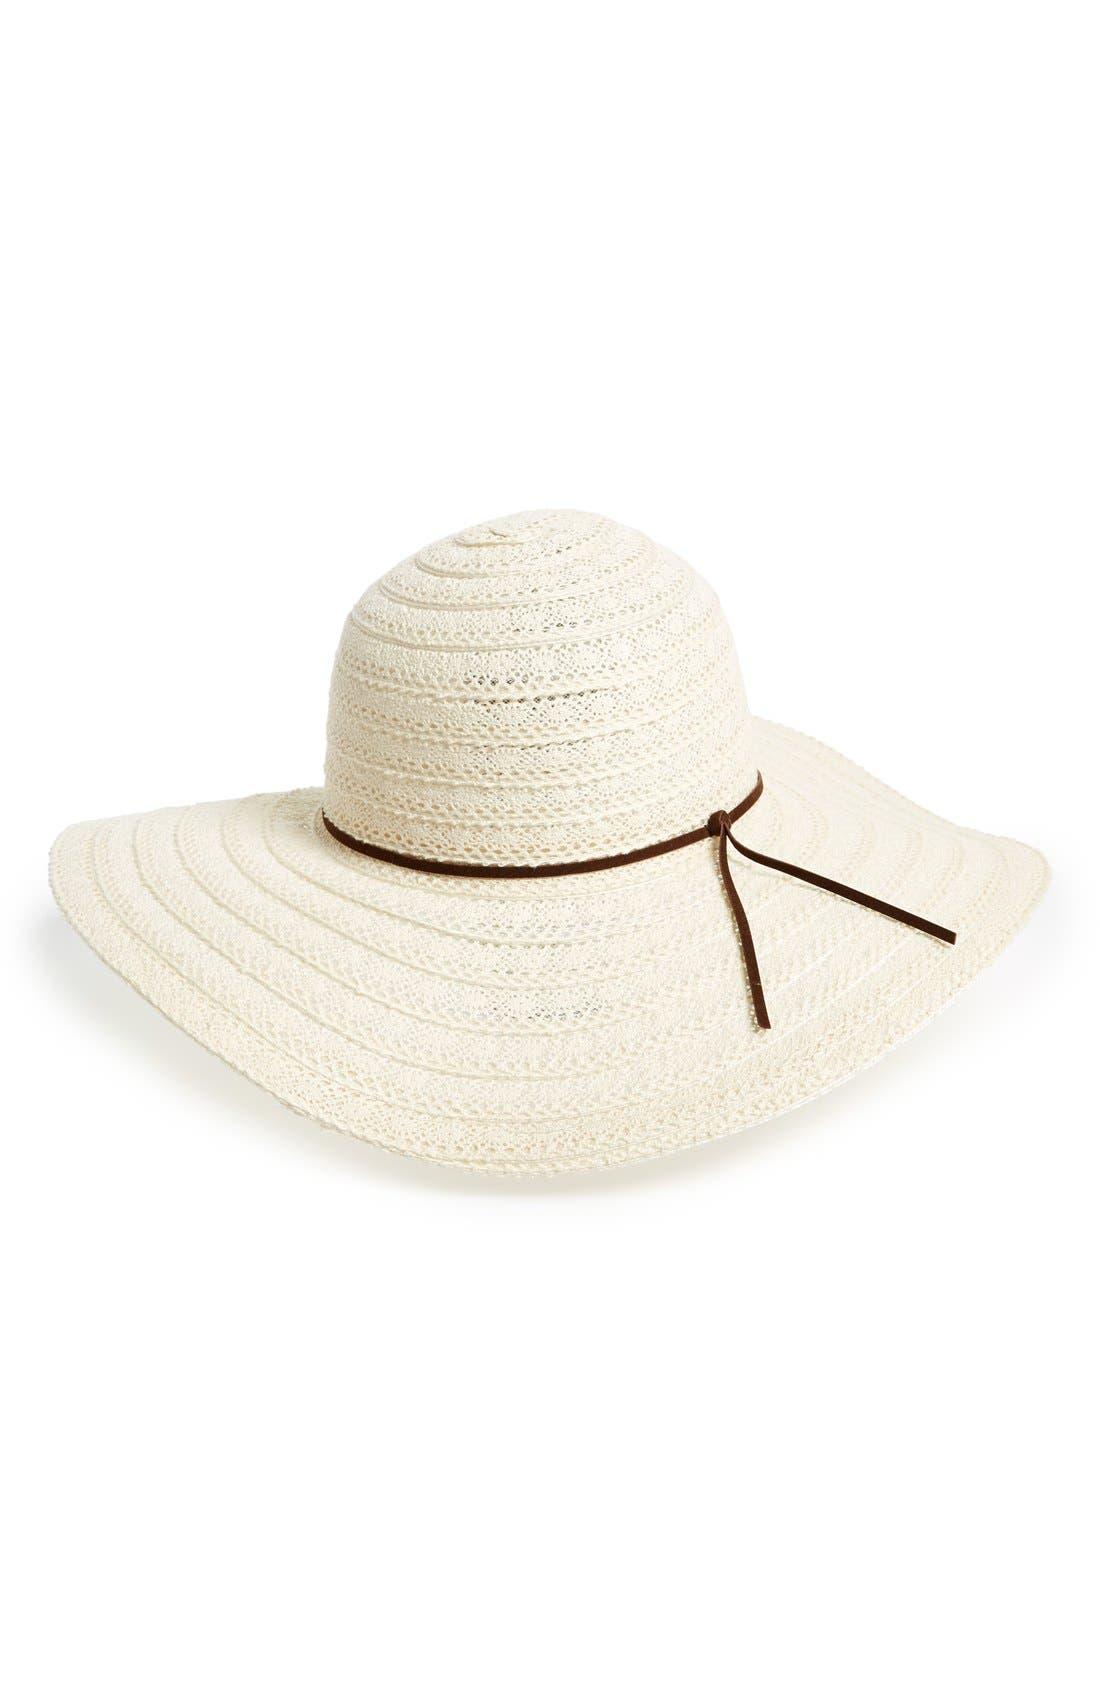 Main Image - Emanuel Geraldo Floppy Lace Hat